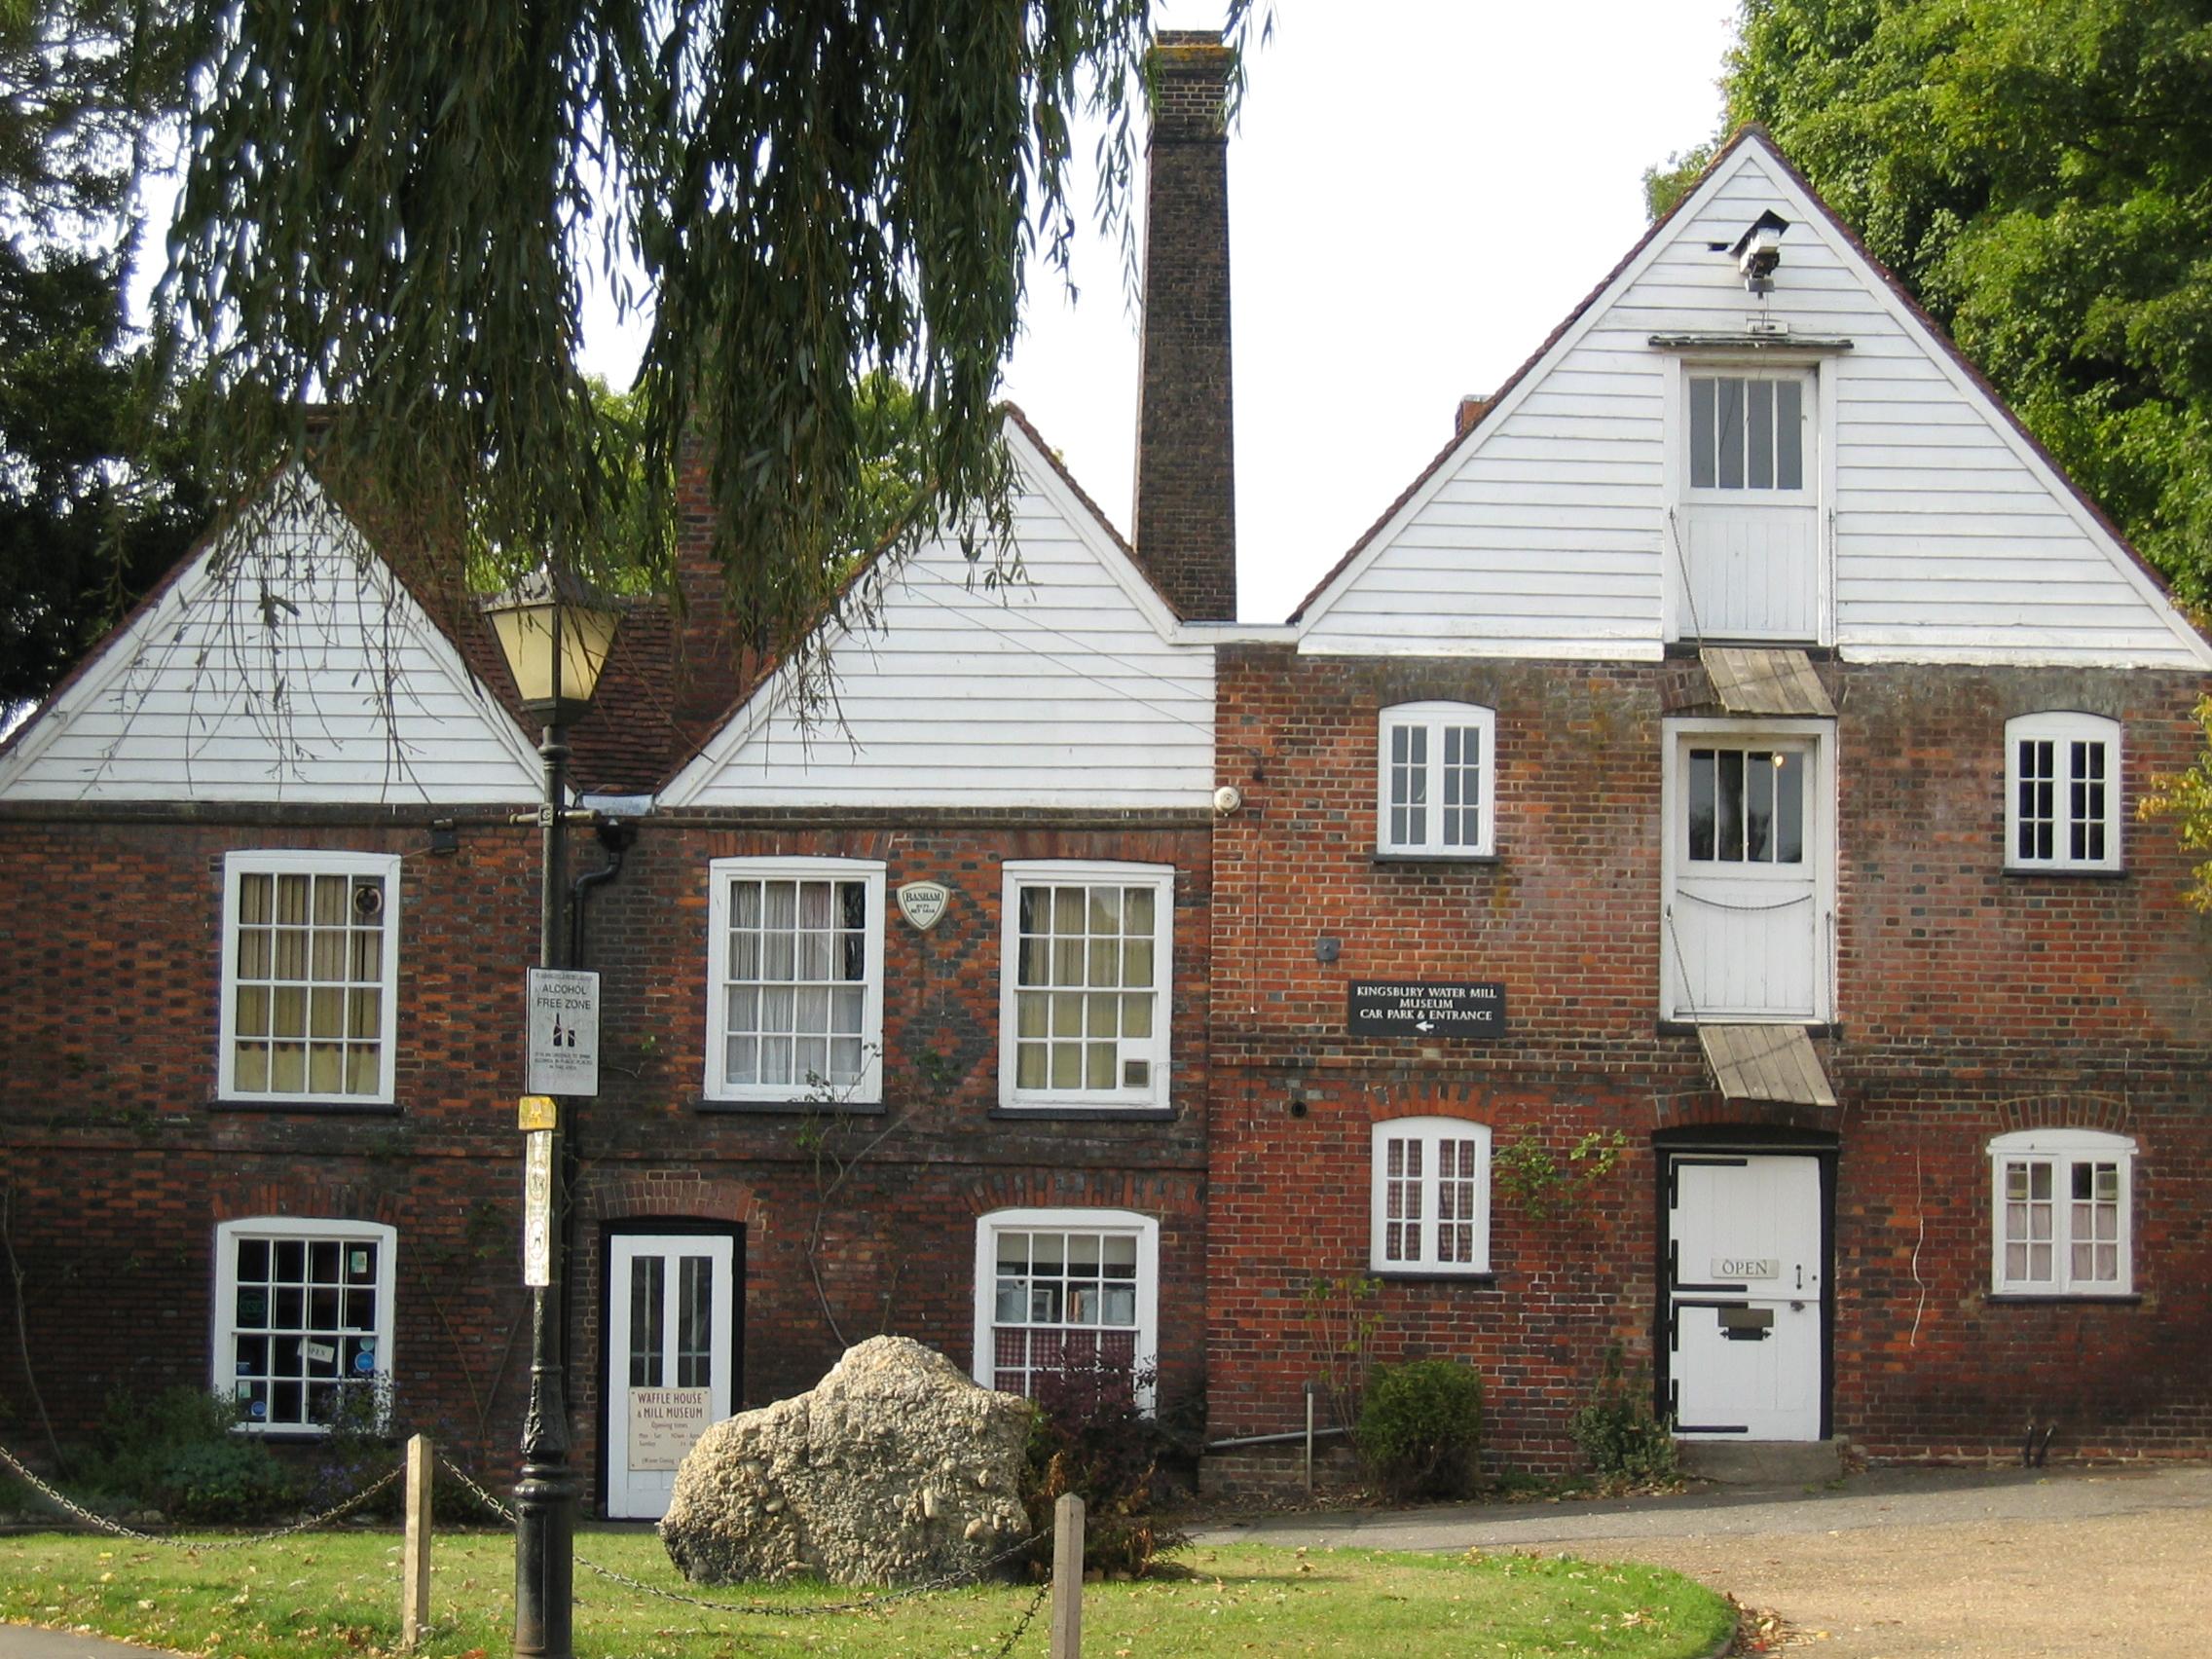 Kingsbury United Kingdom  City pictures : Kingsbury Watermill Museum Broad Clyst, United Kingdom